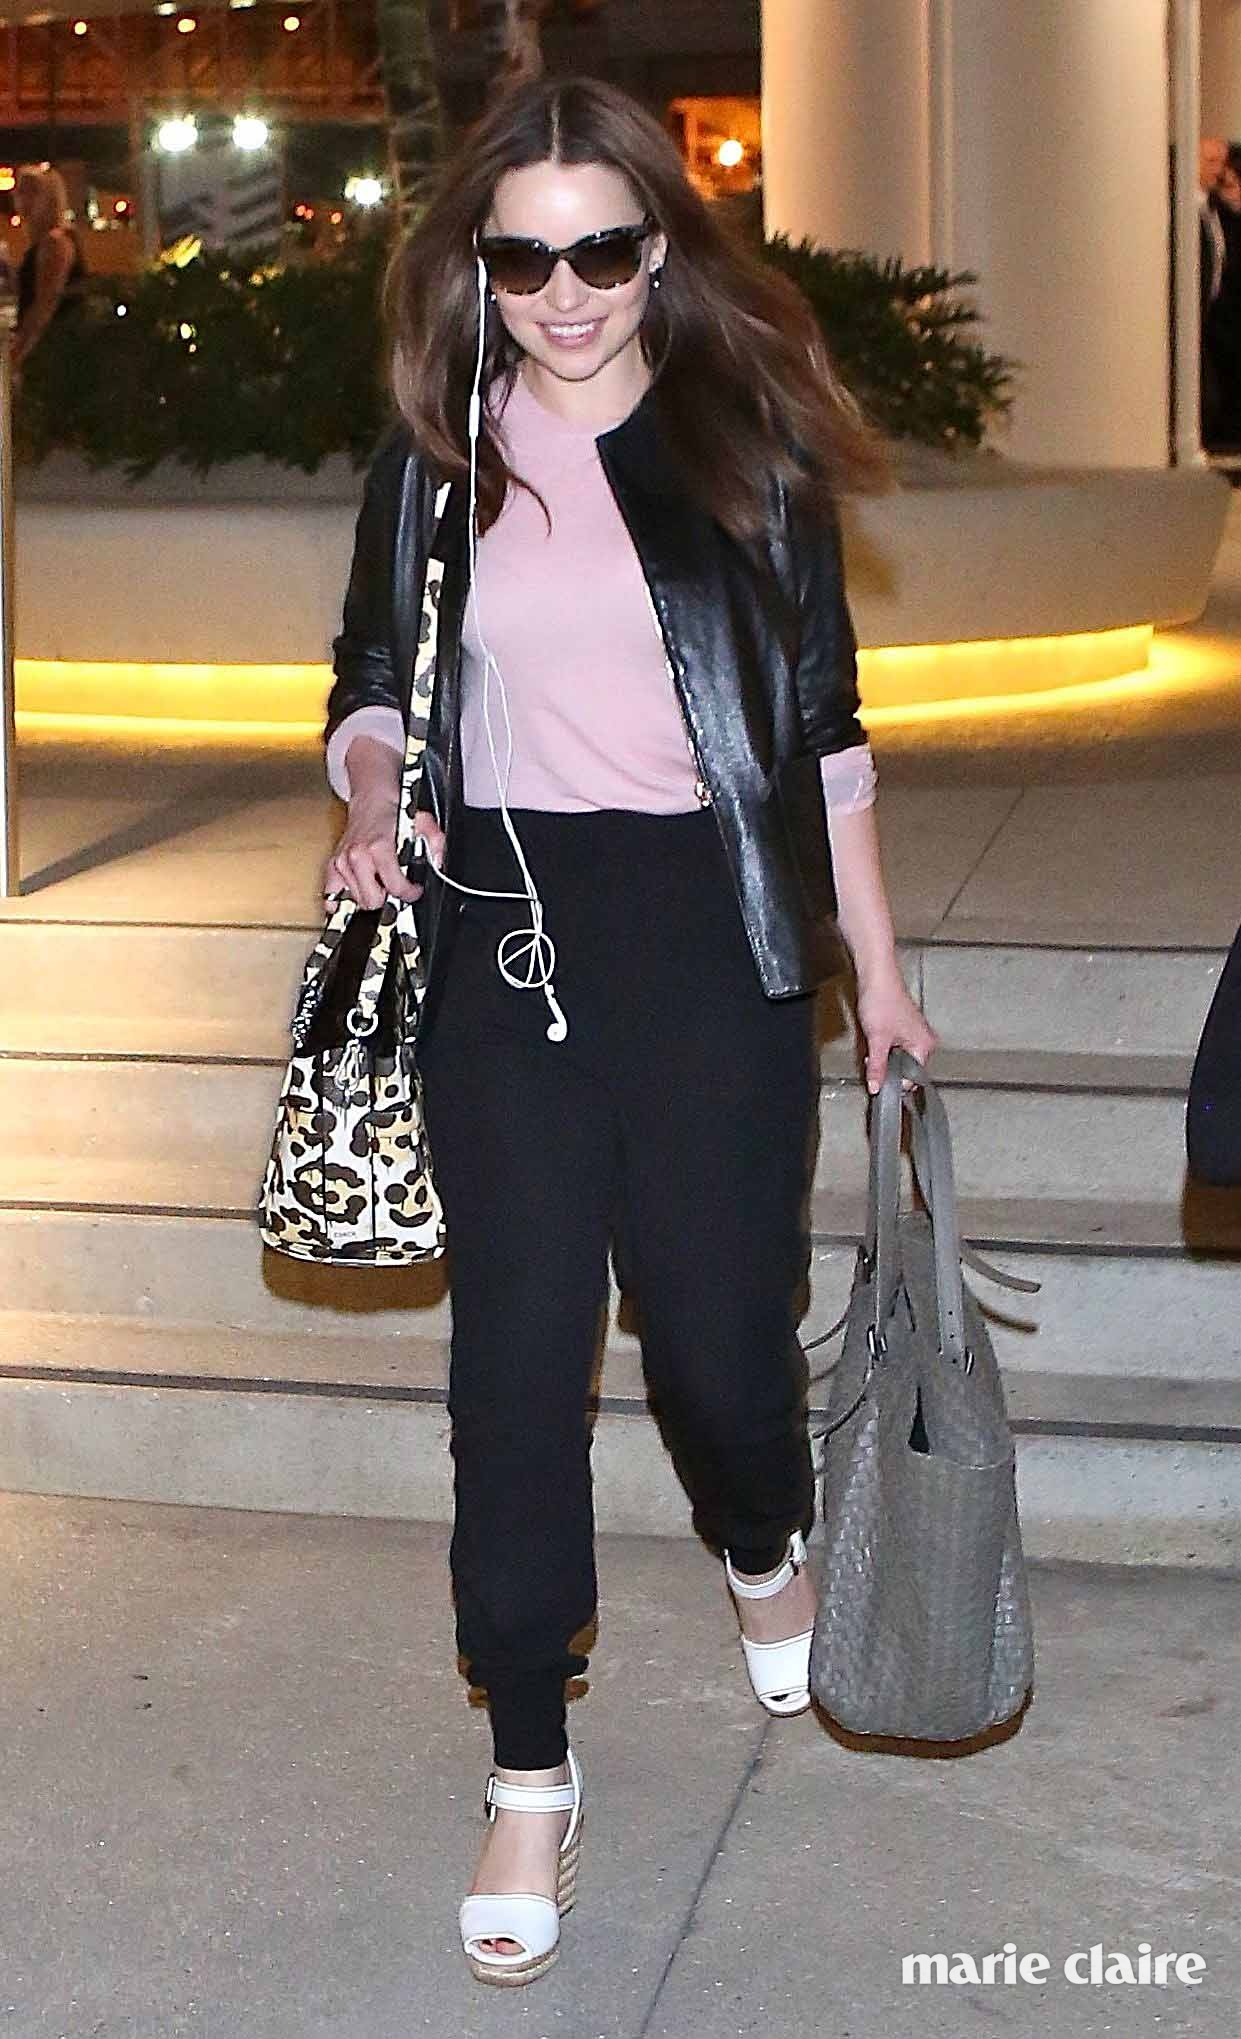 Emilia Clarke departs from Los Angeles International (LAX) airport Featuring: Emilia Clarke Where: Los Angeles, California, United States When: 26 Mar 2015 Credit: WENN.com